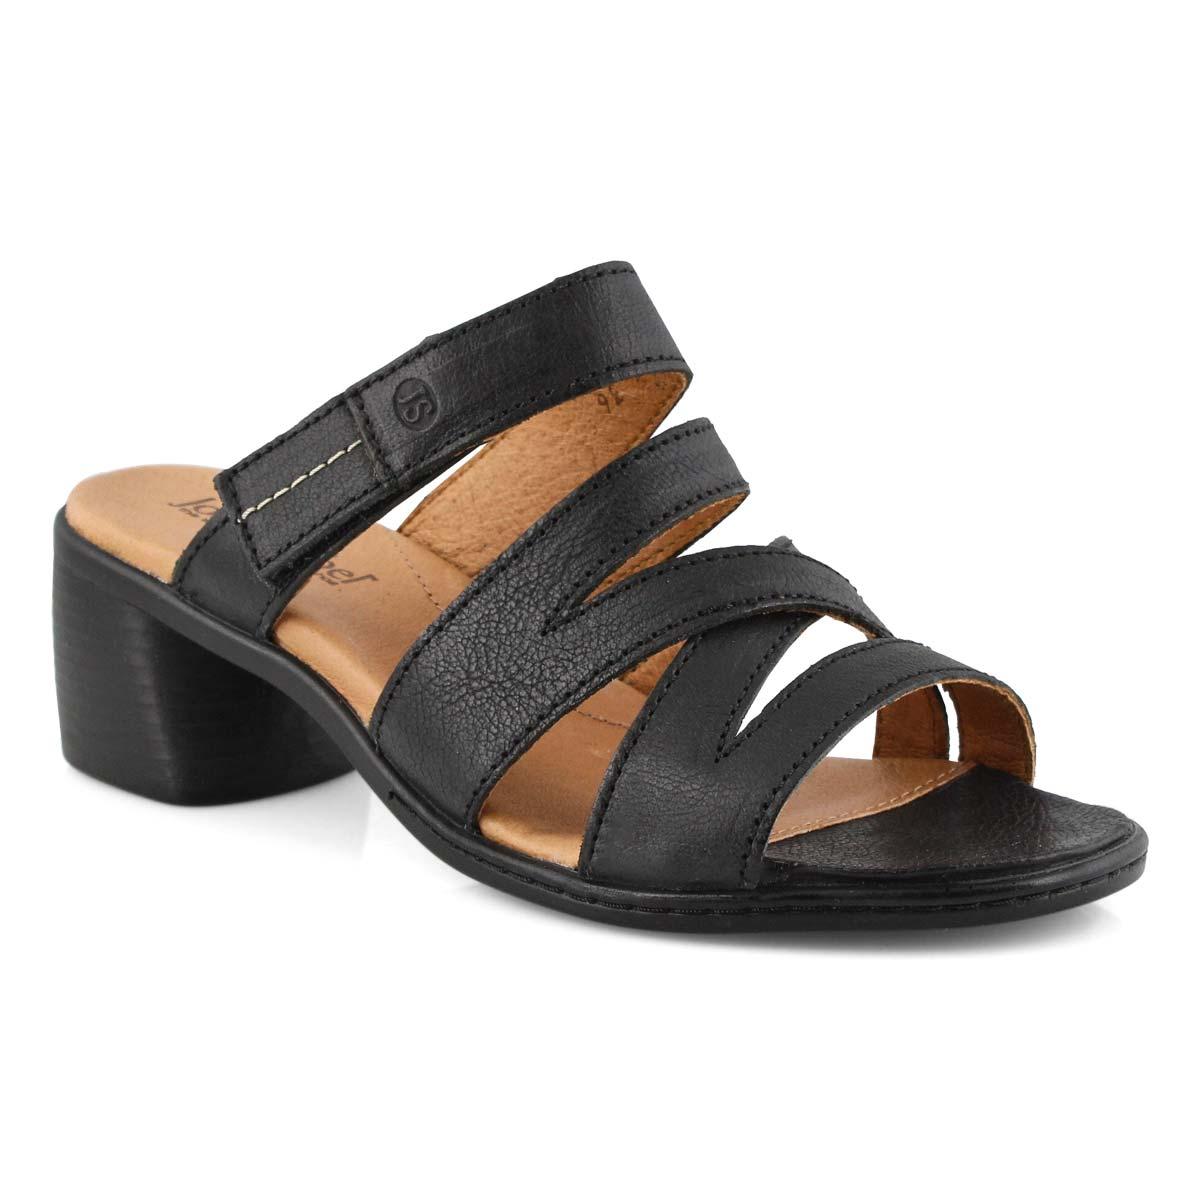 Lds Juna 04 black casual heel sandal